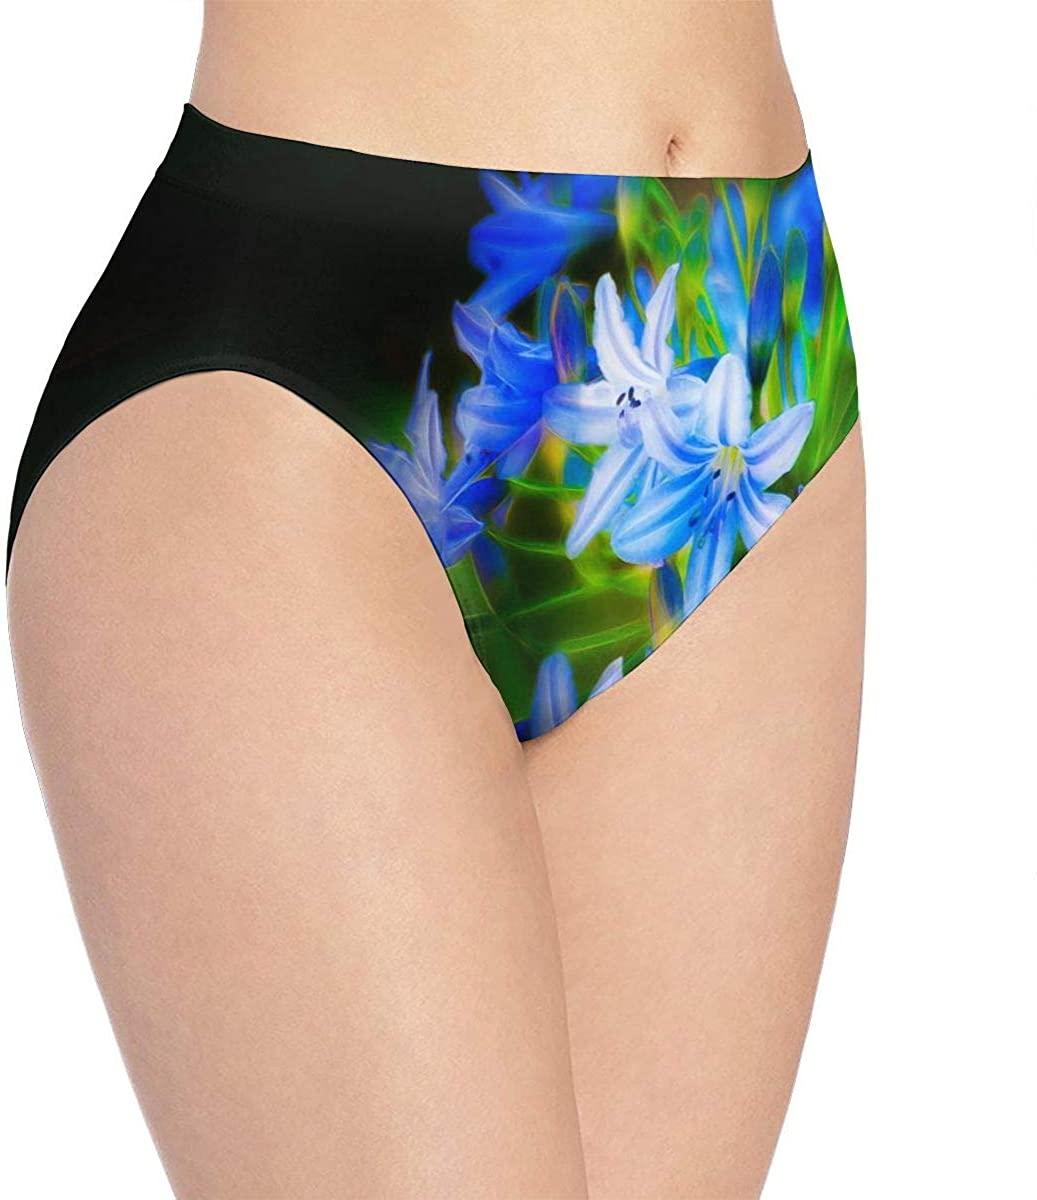 YQINING Womens Seamless Underwear Blue Flowers Bikini Panties Stretch Briefs Laser Cut